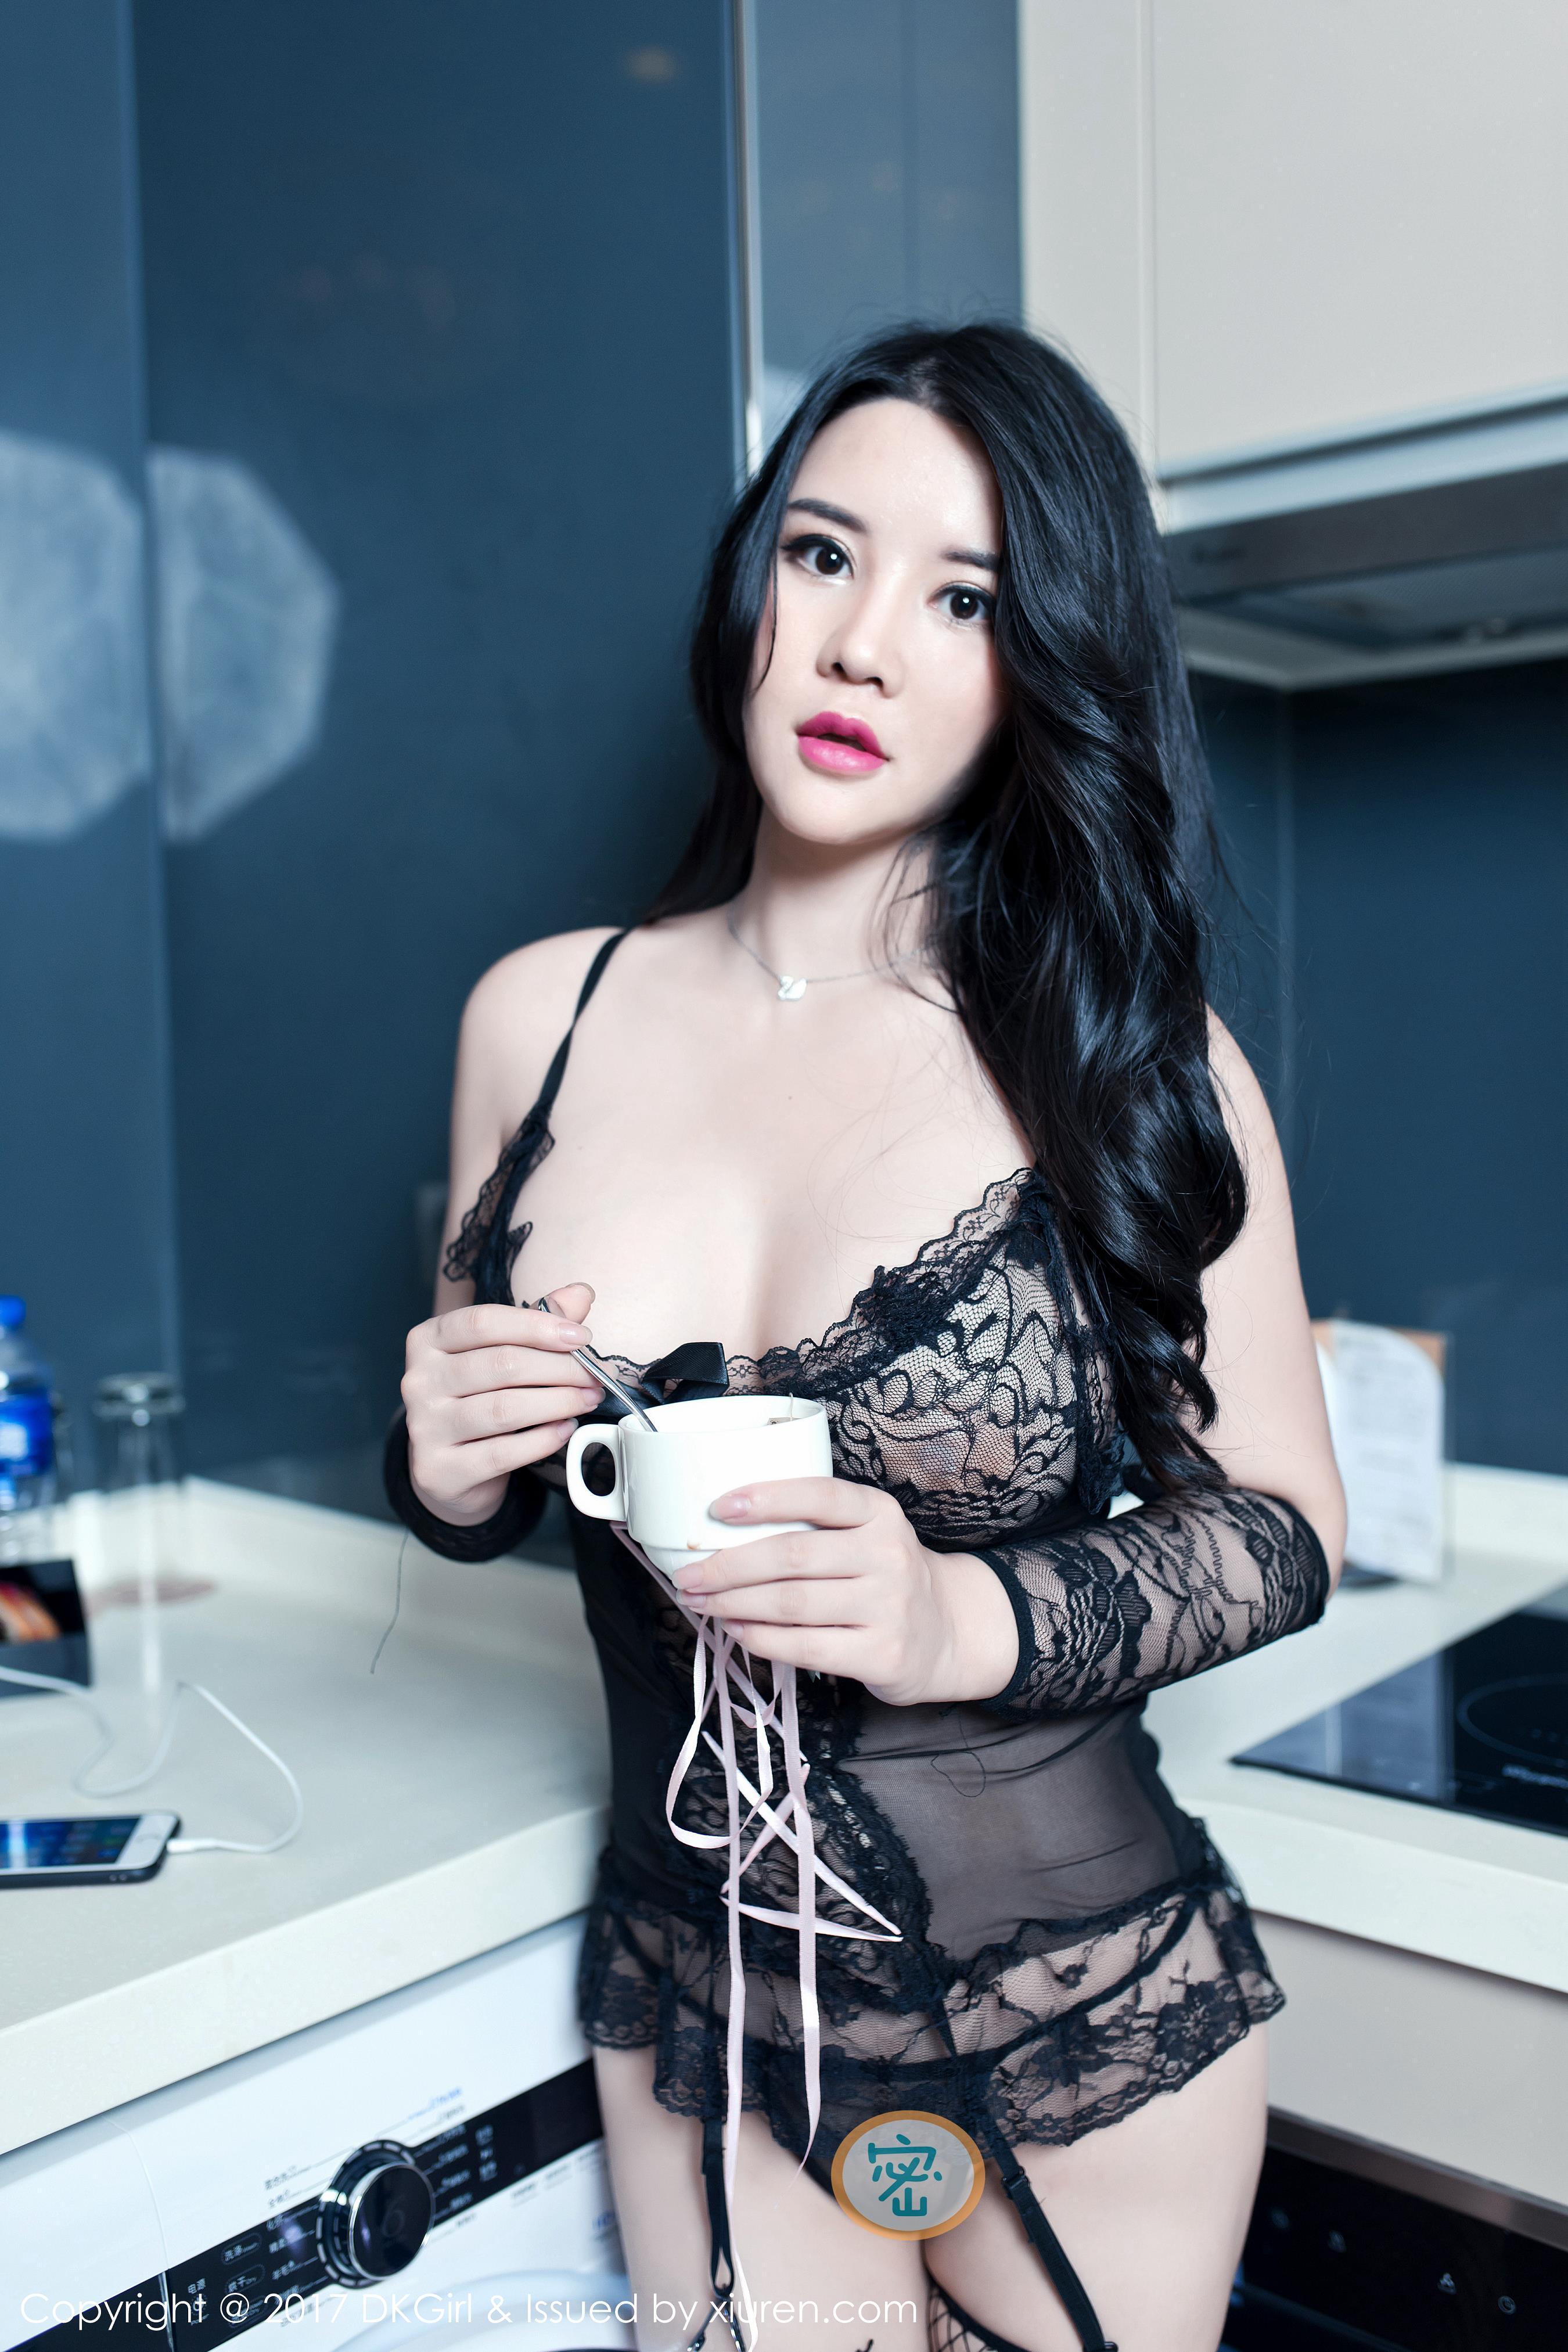 [DKGirl御女郎]DK20171019VOL0042 Sukki 黑色透视情趣连身裙与性感连体内衣私房写真集